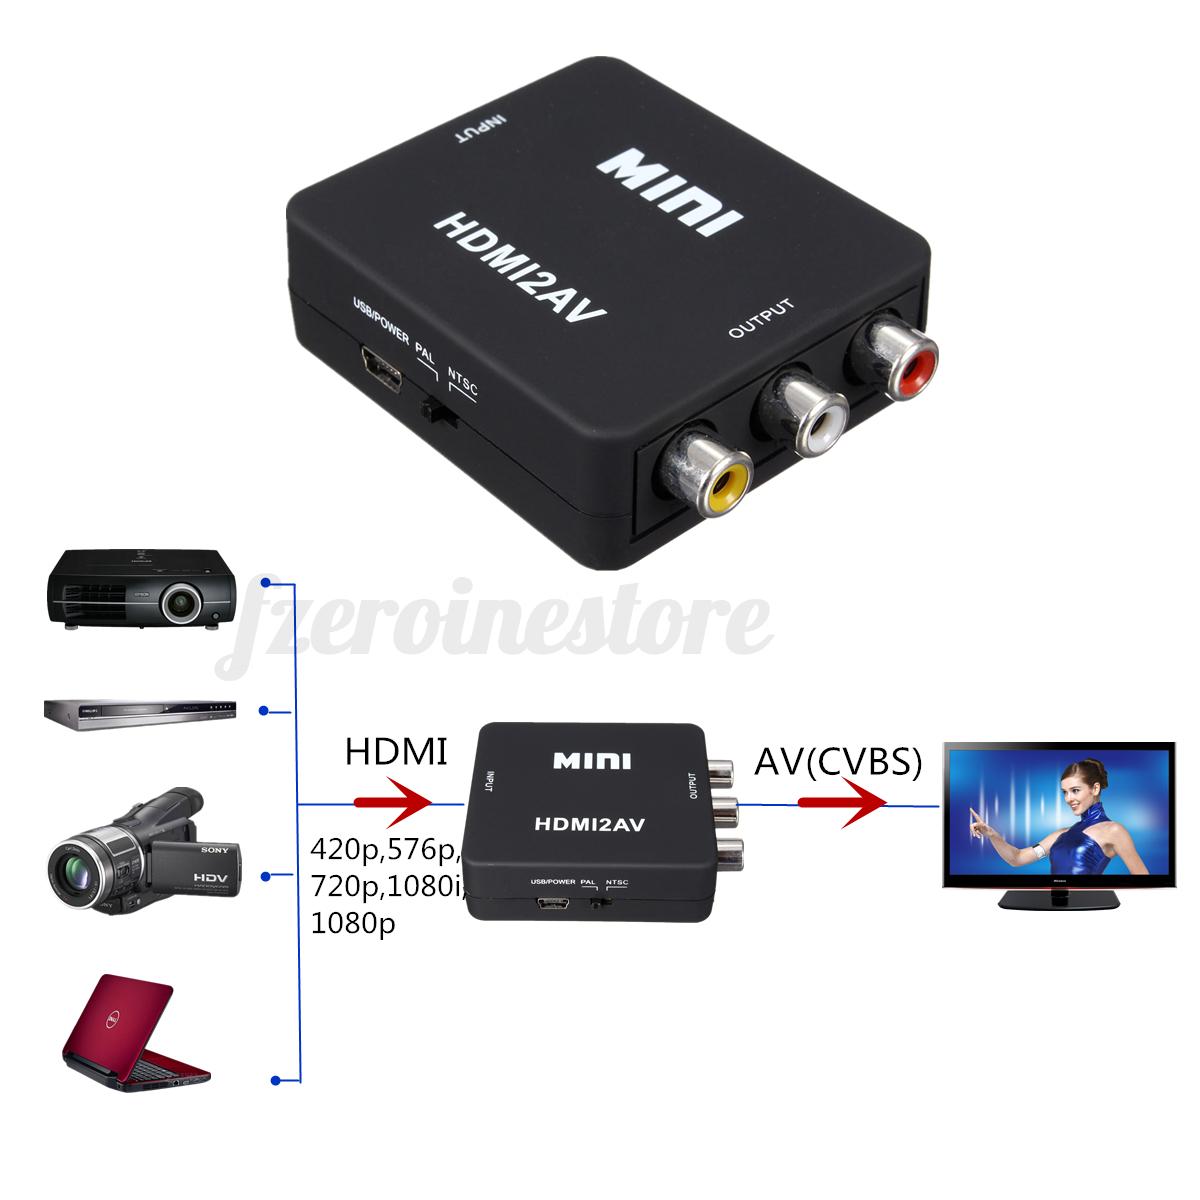 mini composite 720p 1080p hdmi to 3rca audio video av cvbs adapter converter tv ebay. Black Bedroom Furniture Sets. Home Design Ideas